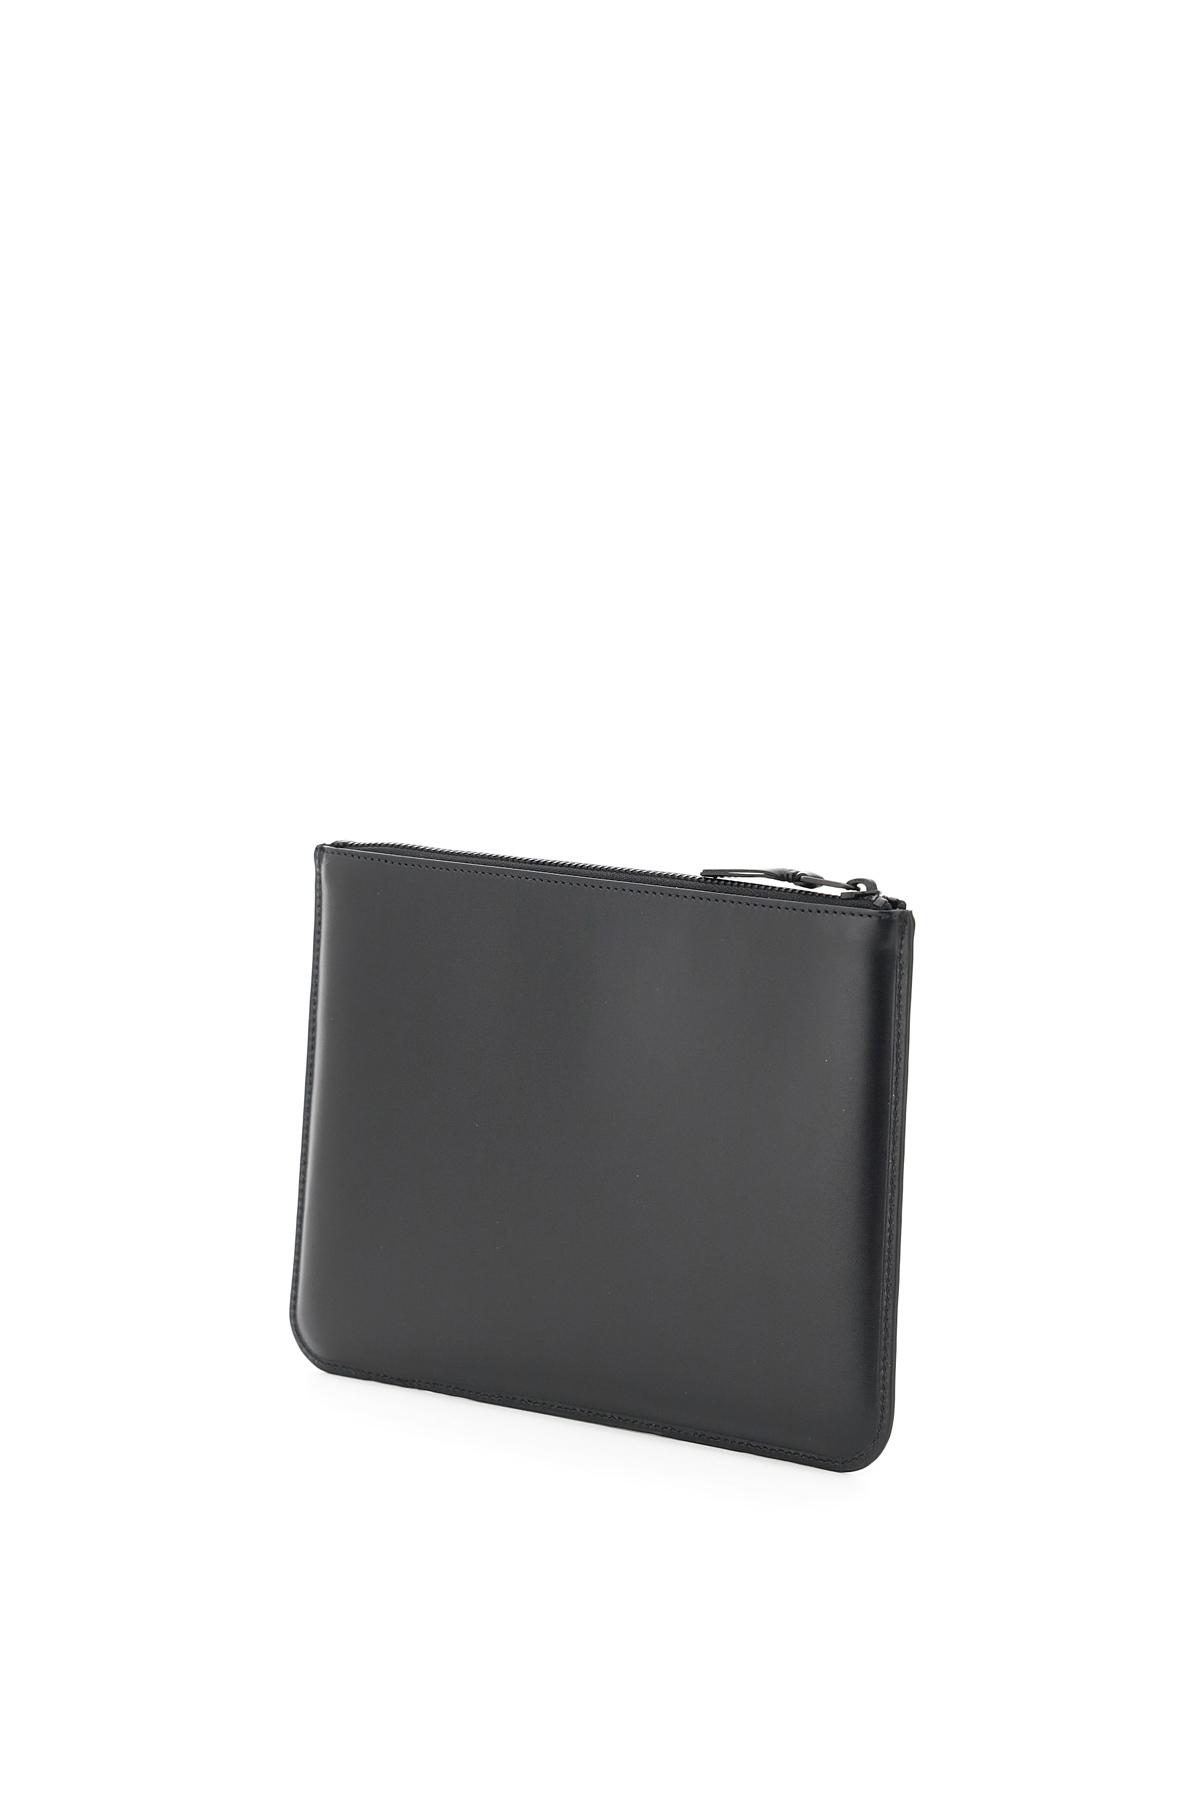 Comme des garcons wallet pouch very black